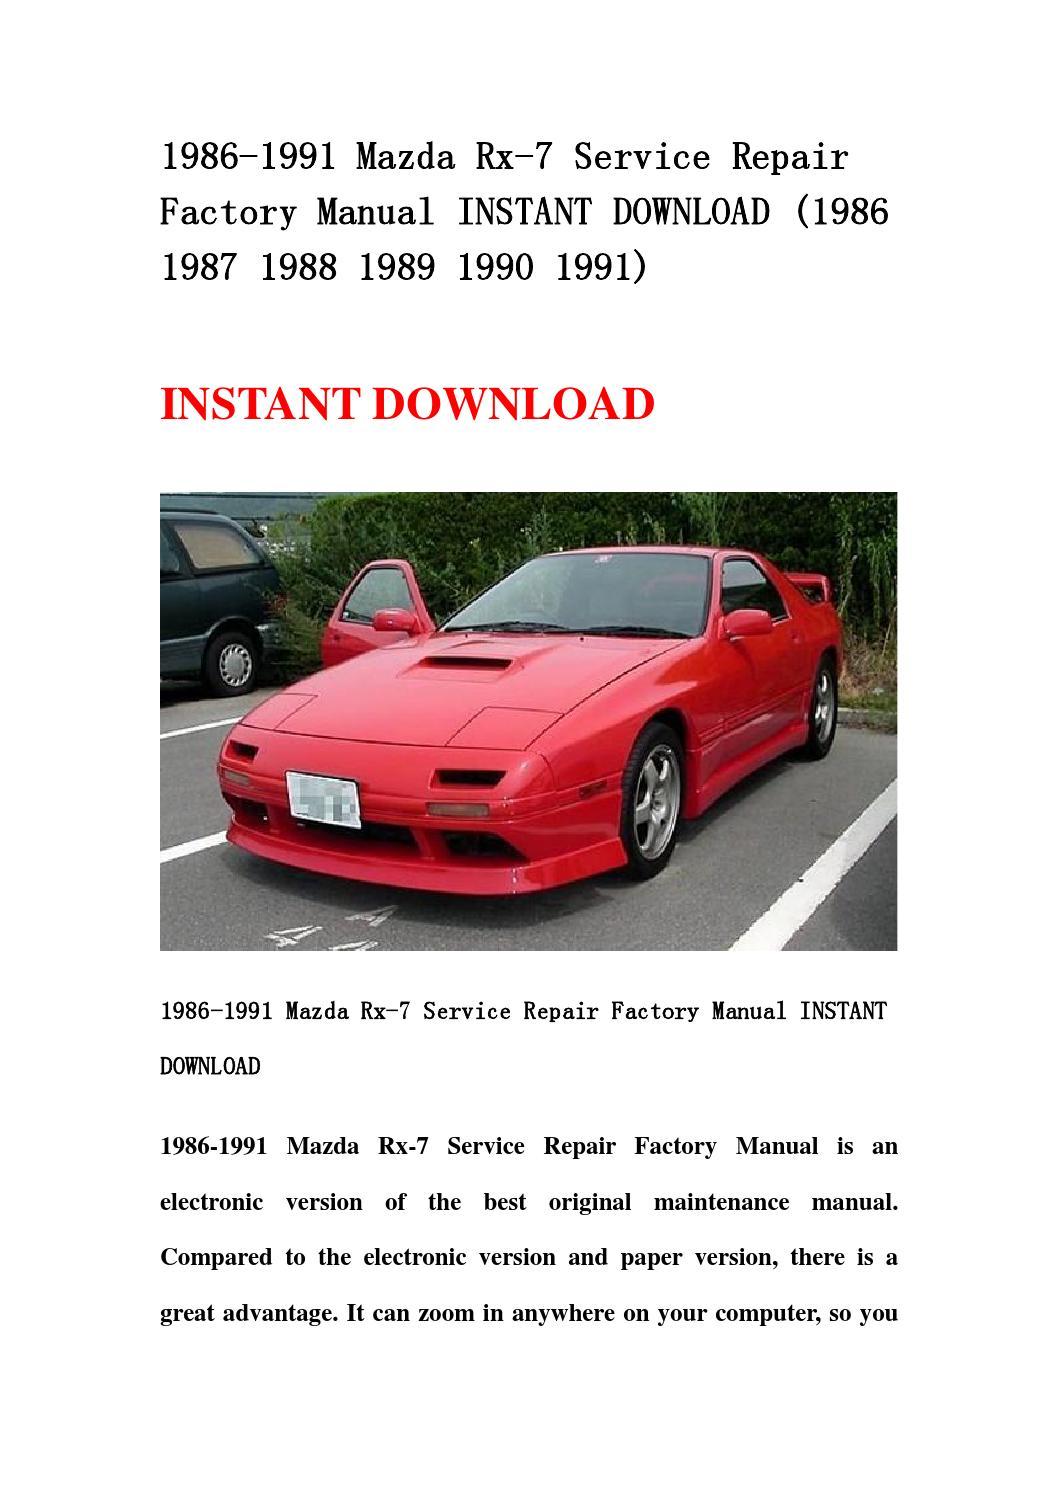 1986 1991 mazda rx 7 service repair factory manual instant